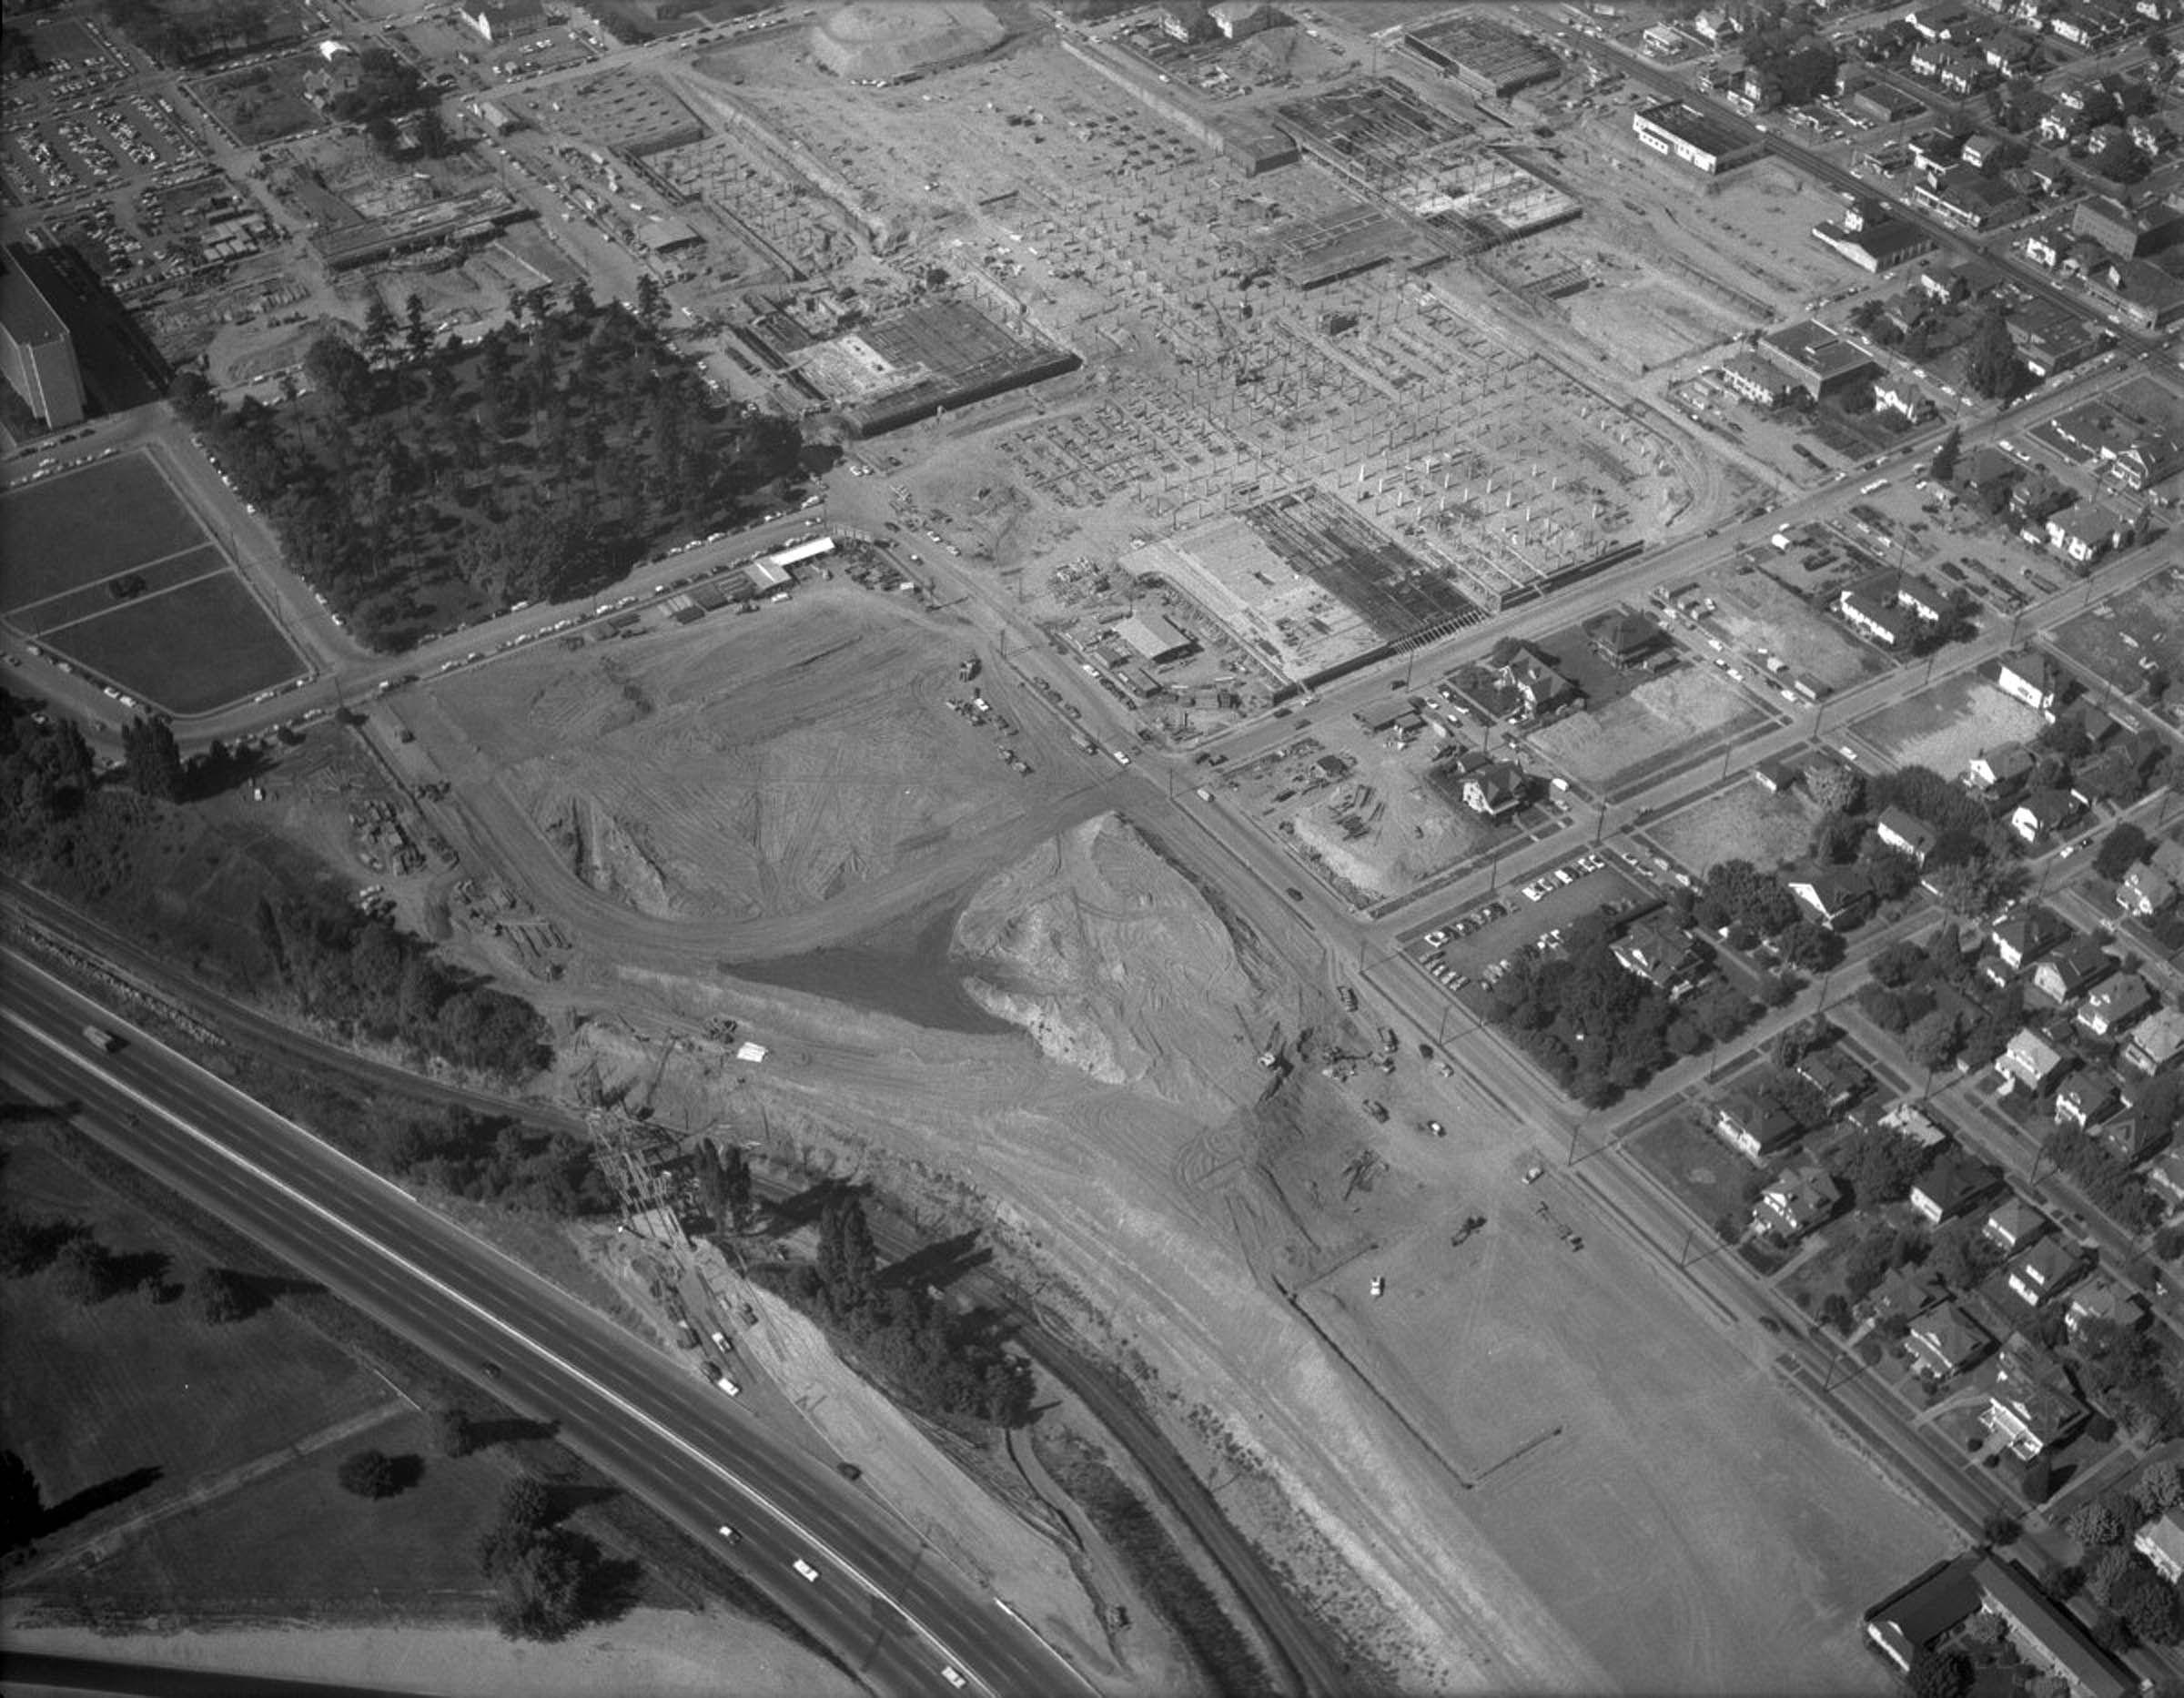 eye health northwest oregon city